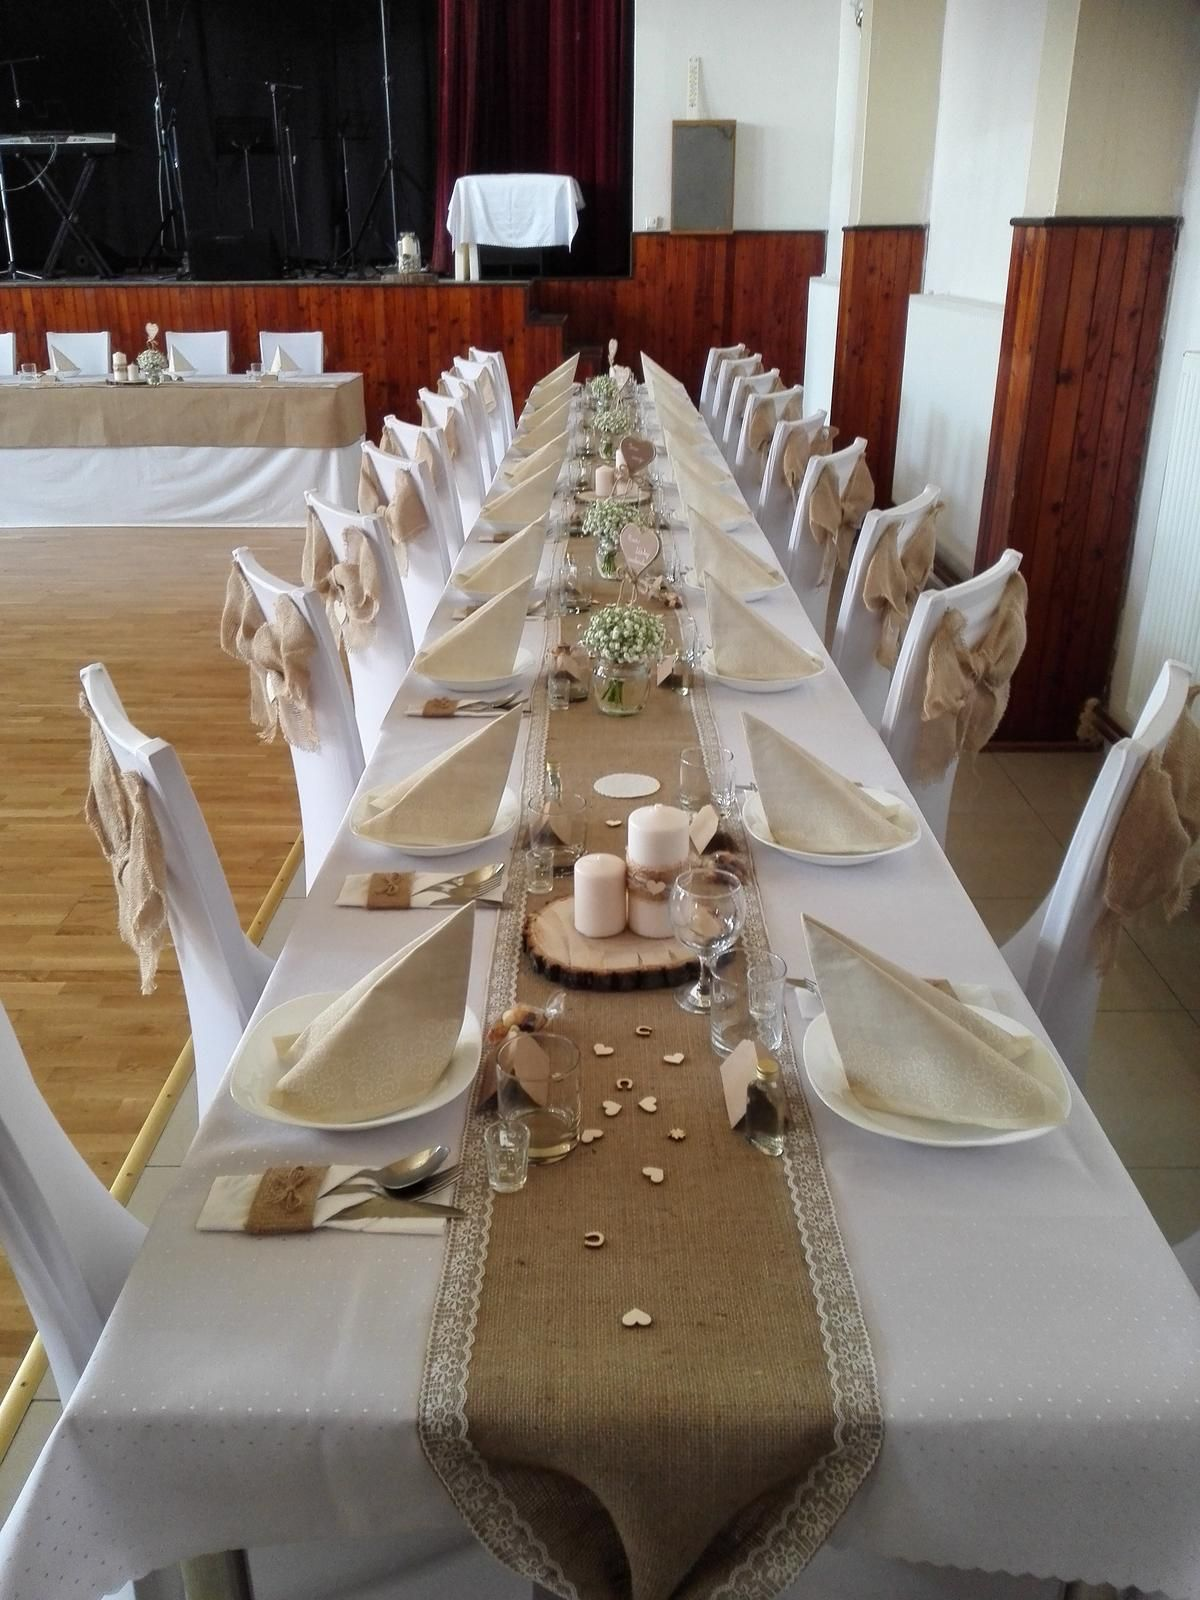 Svadobna Vyzdoba Juta 45153562 P Jpg 1200 1600 Boho Wedding Rustic Wedding Decor Wedding Table